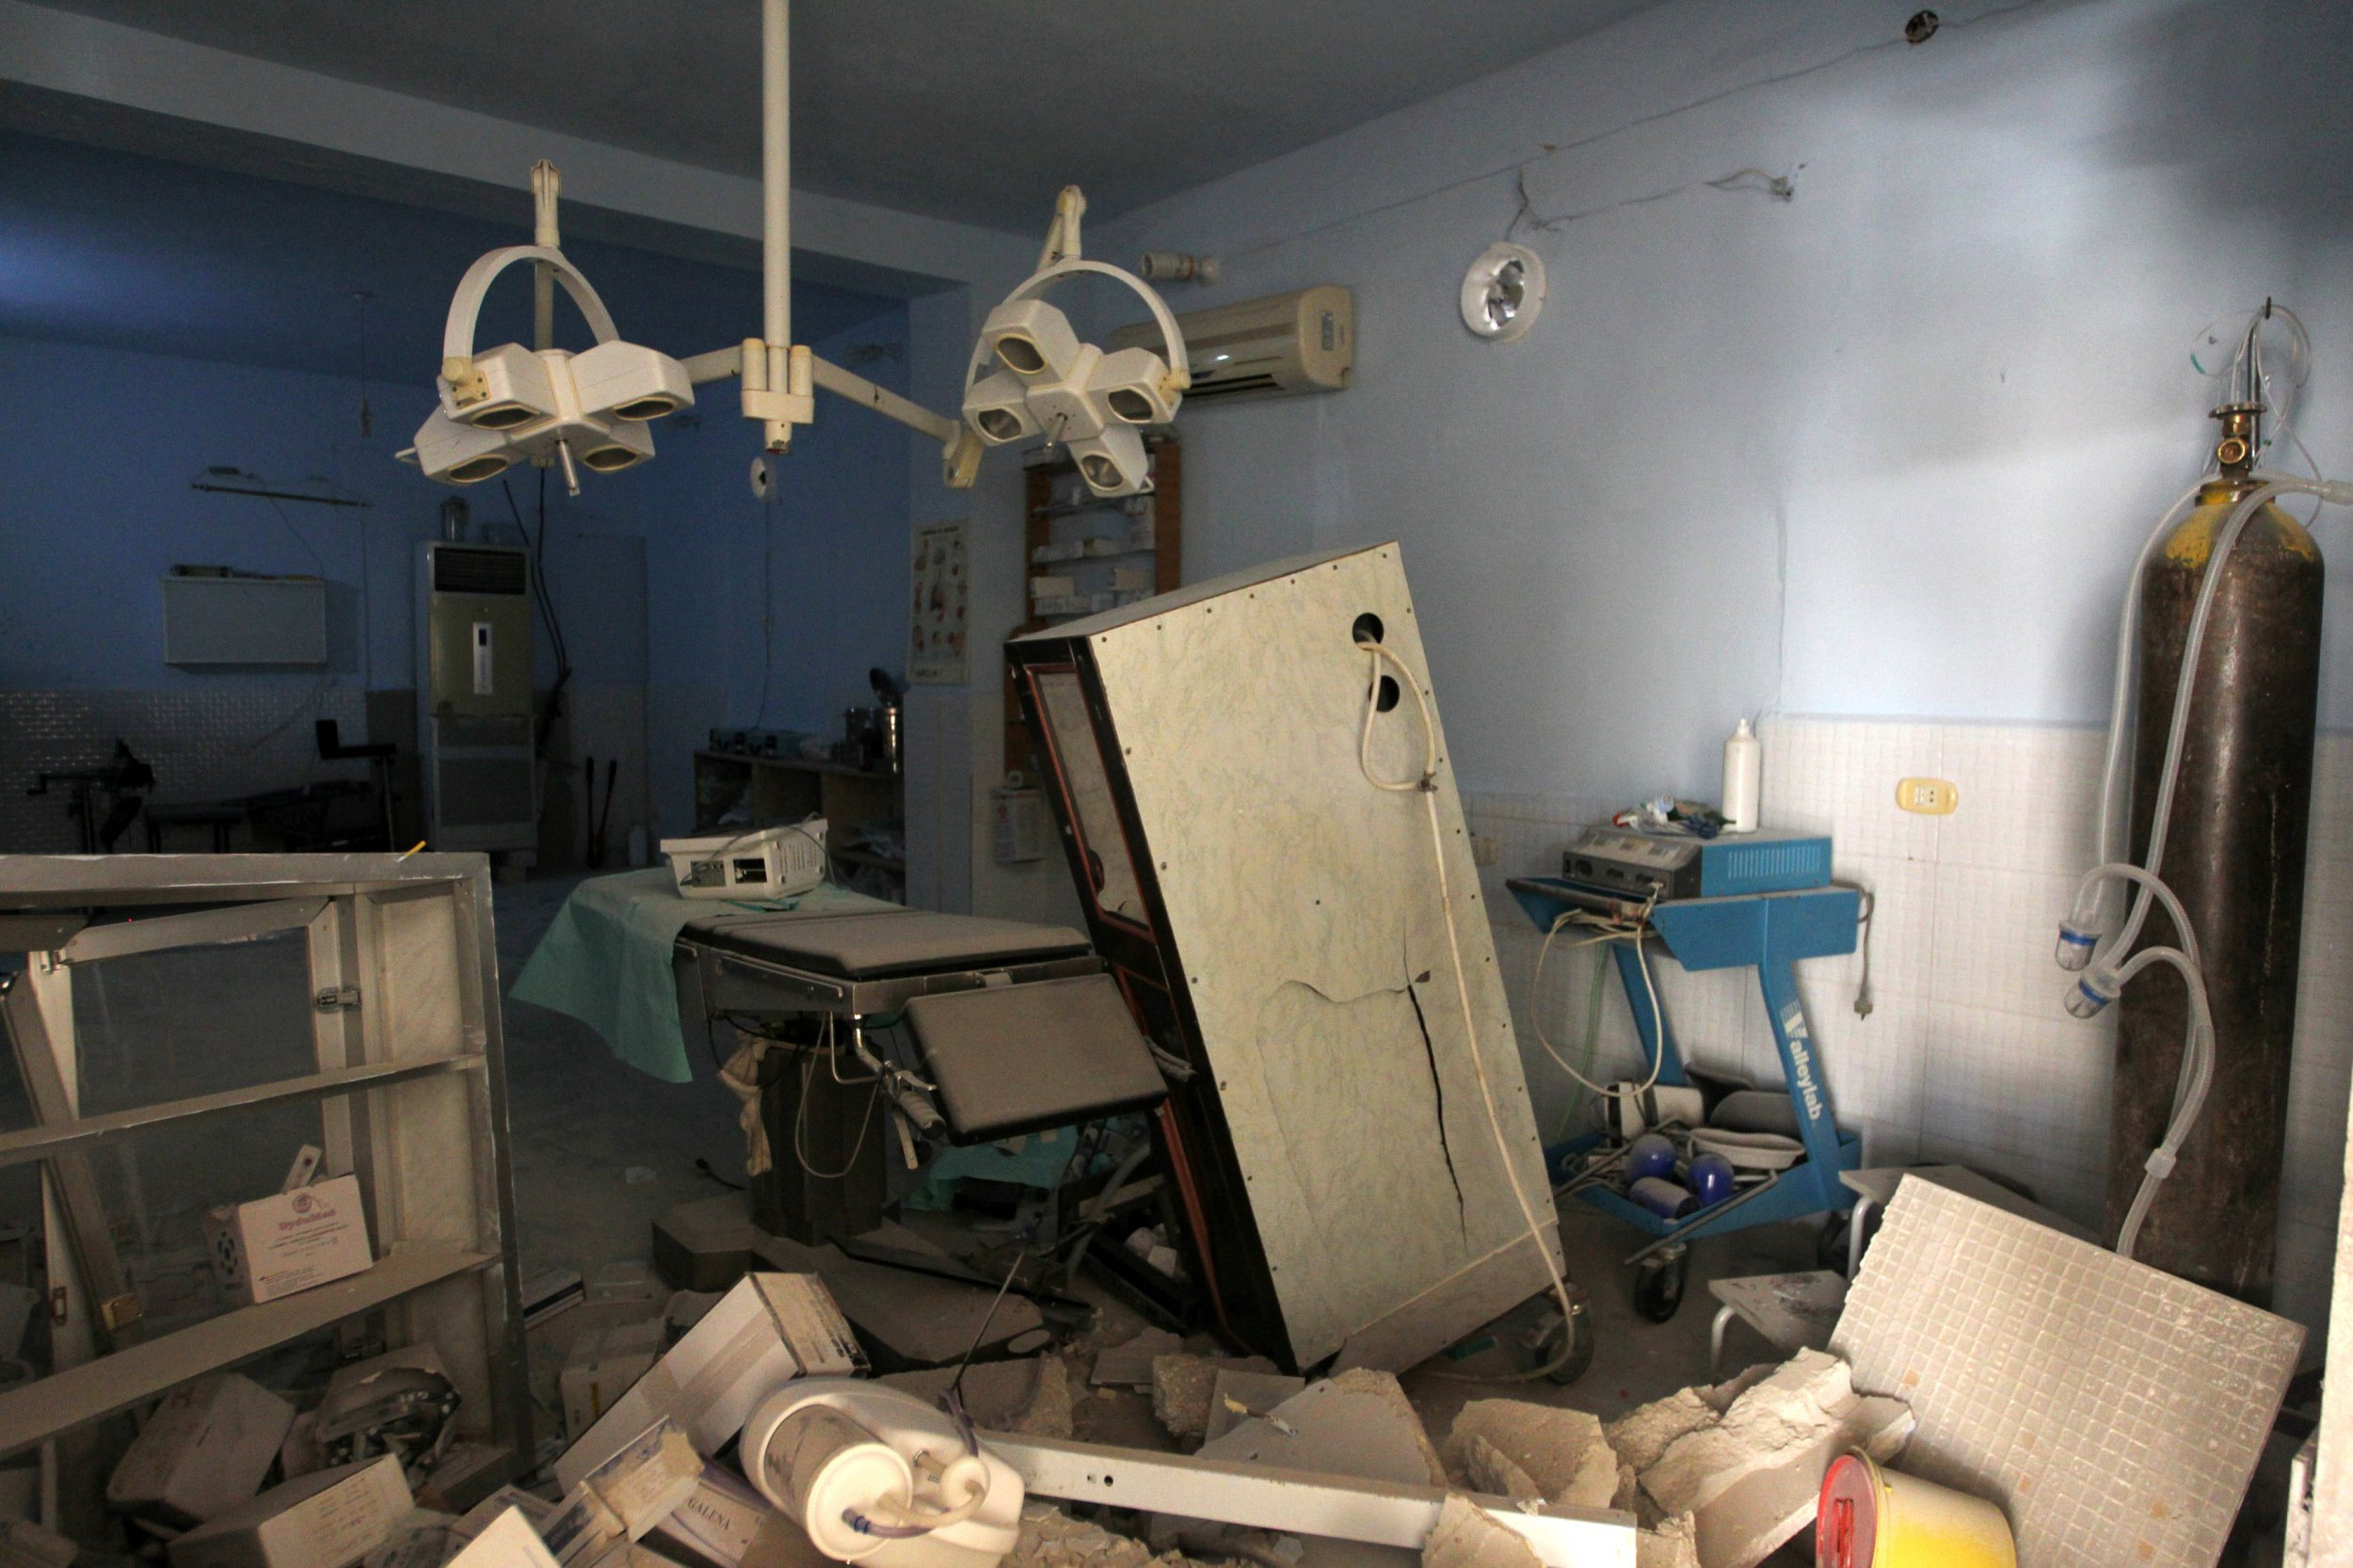 syria_hospital_letter_0826